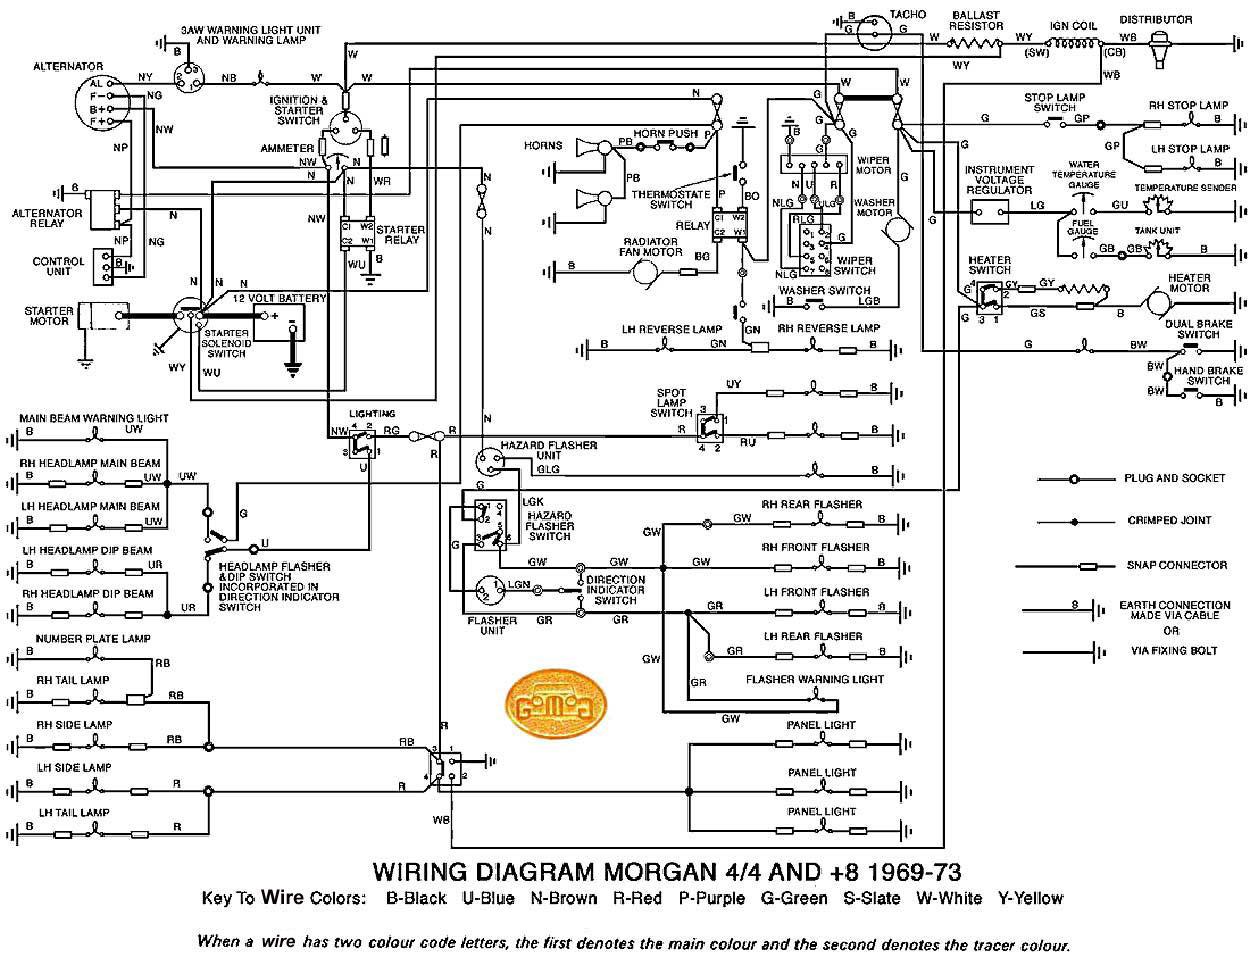 1969 mustang fuse box wiring diagram